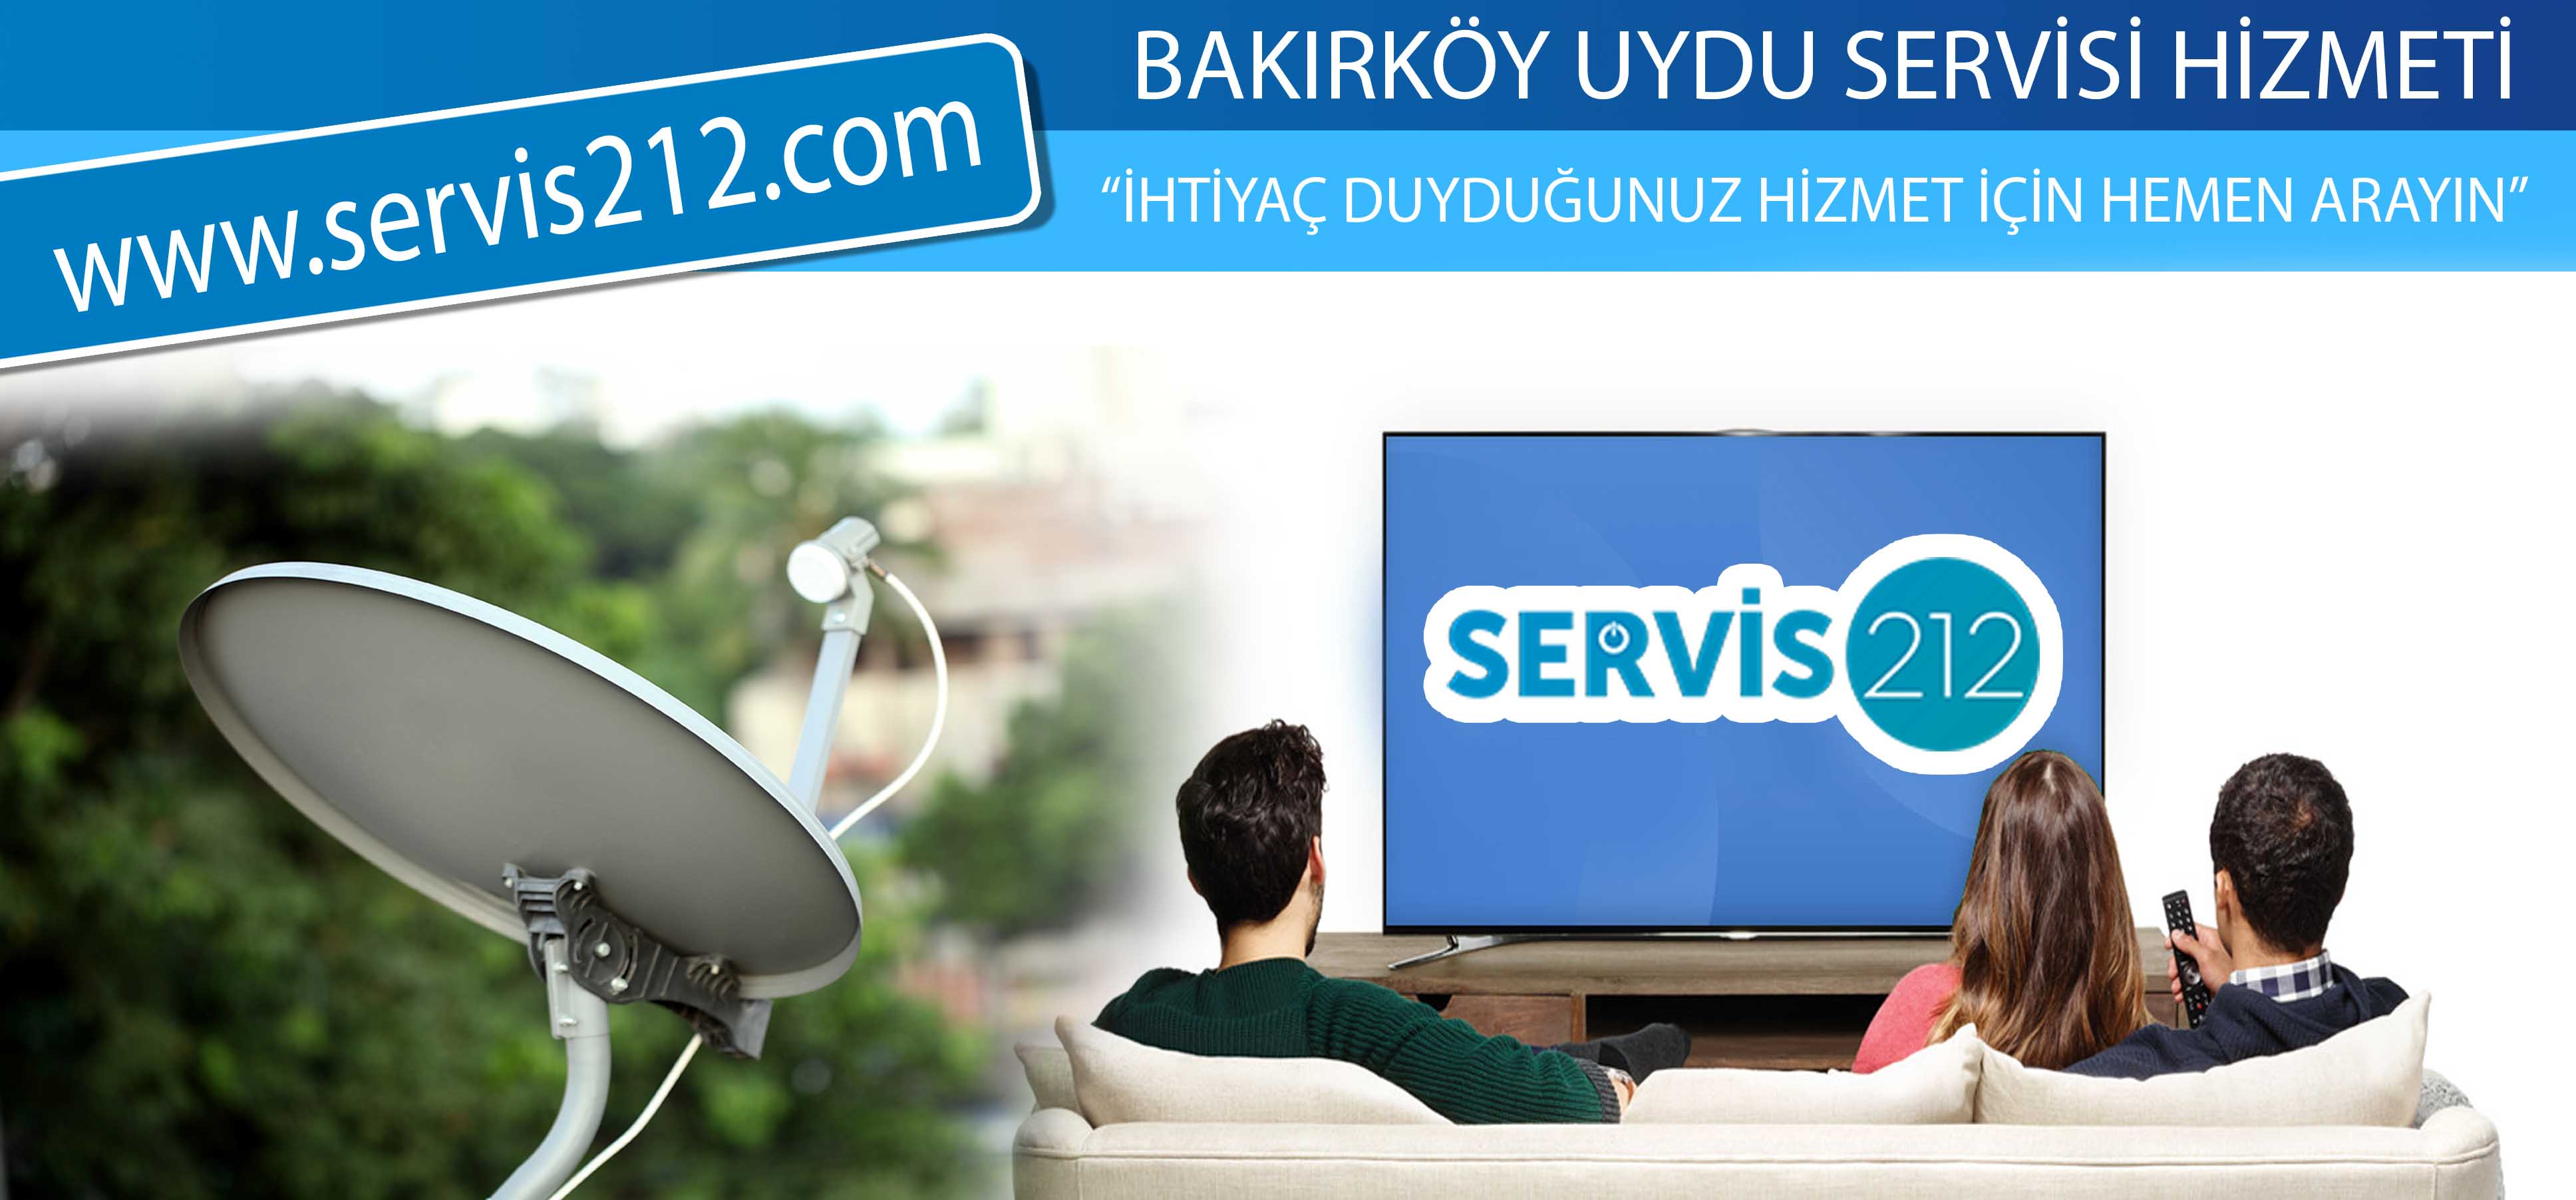 bakirkoy_uydu_servisi